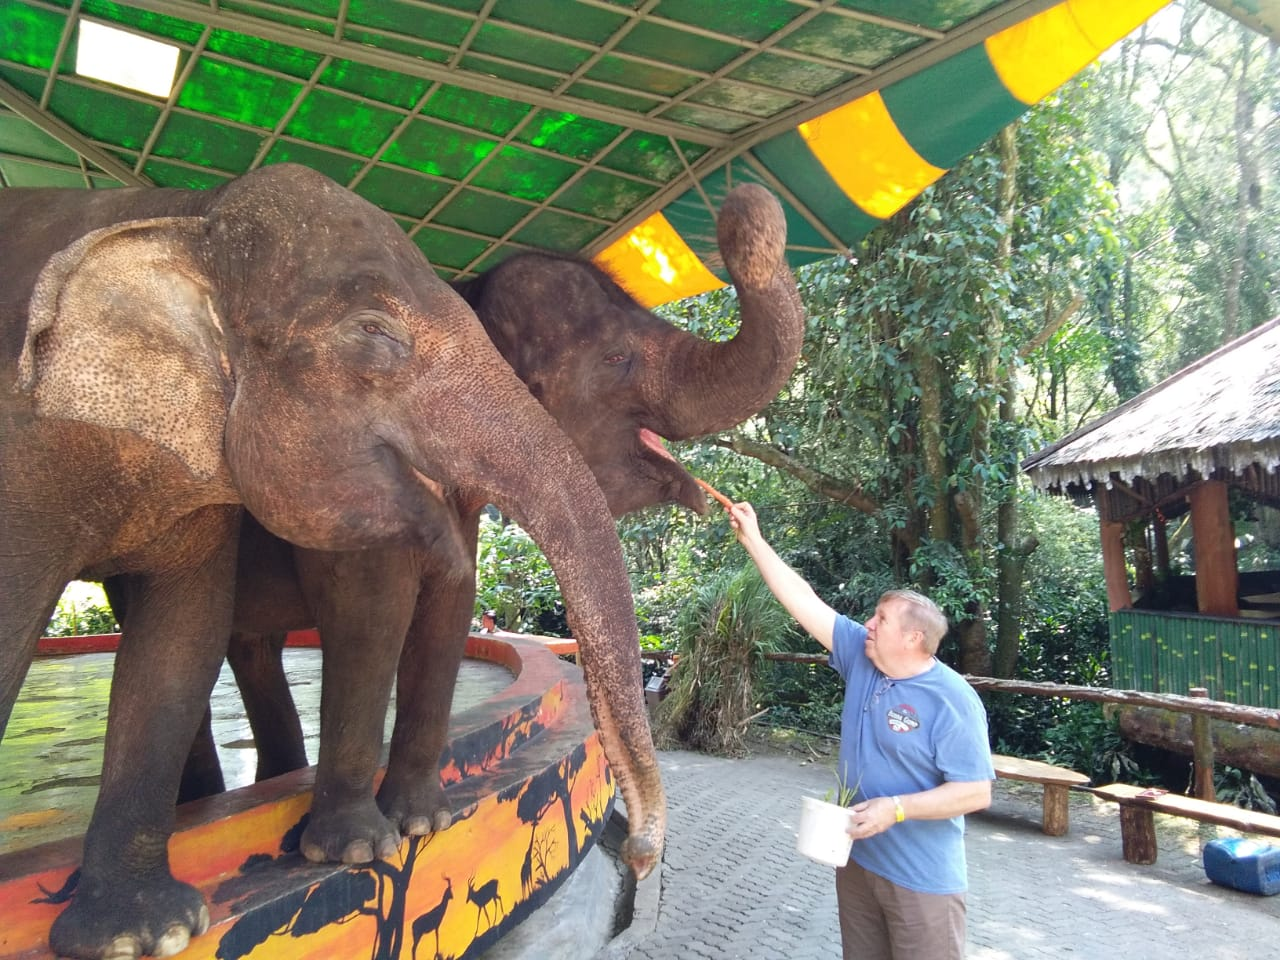 wisata keluarga taman safari - yoexplore, liburan keluarga - yoexplore.co.id